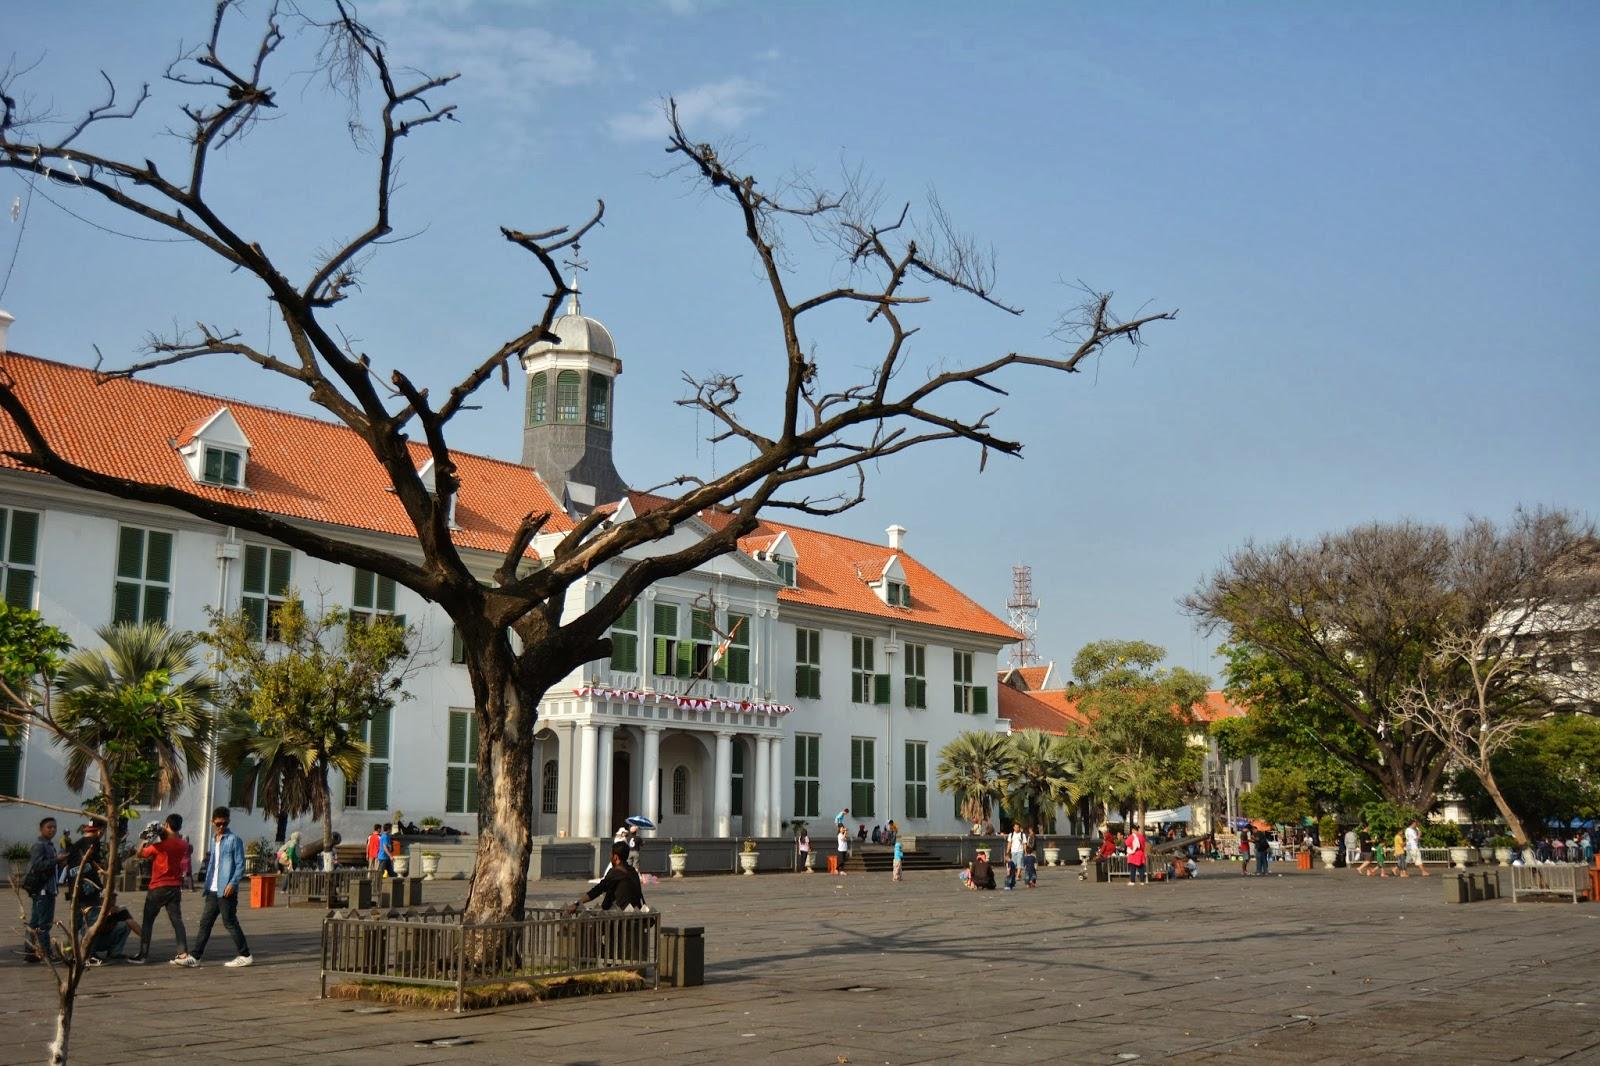 Curhatan pengamen Kota Tua Jakarta, revitalisasi mengancam pekerjaan